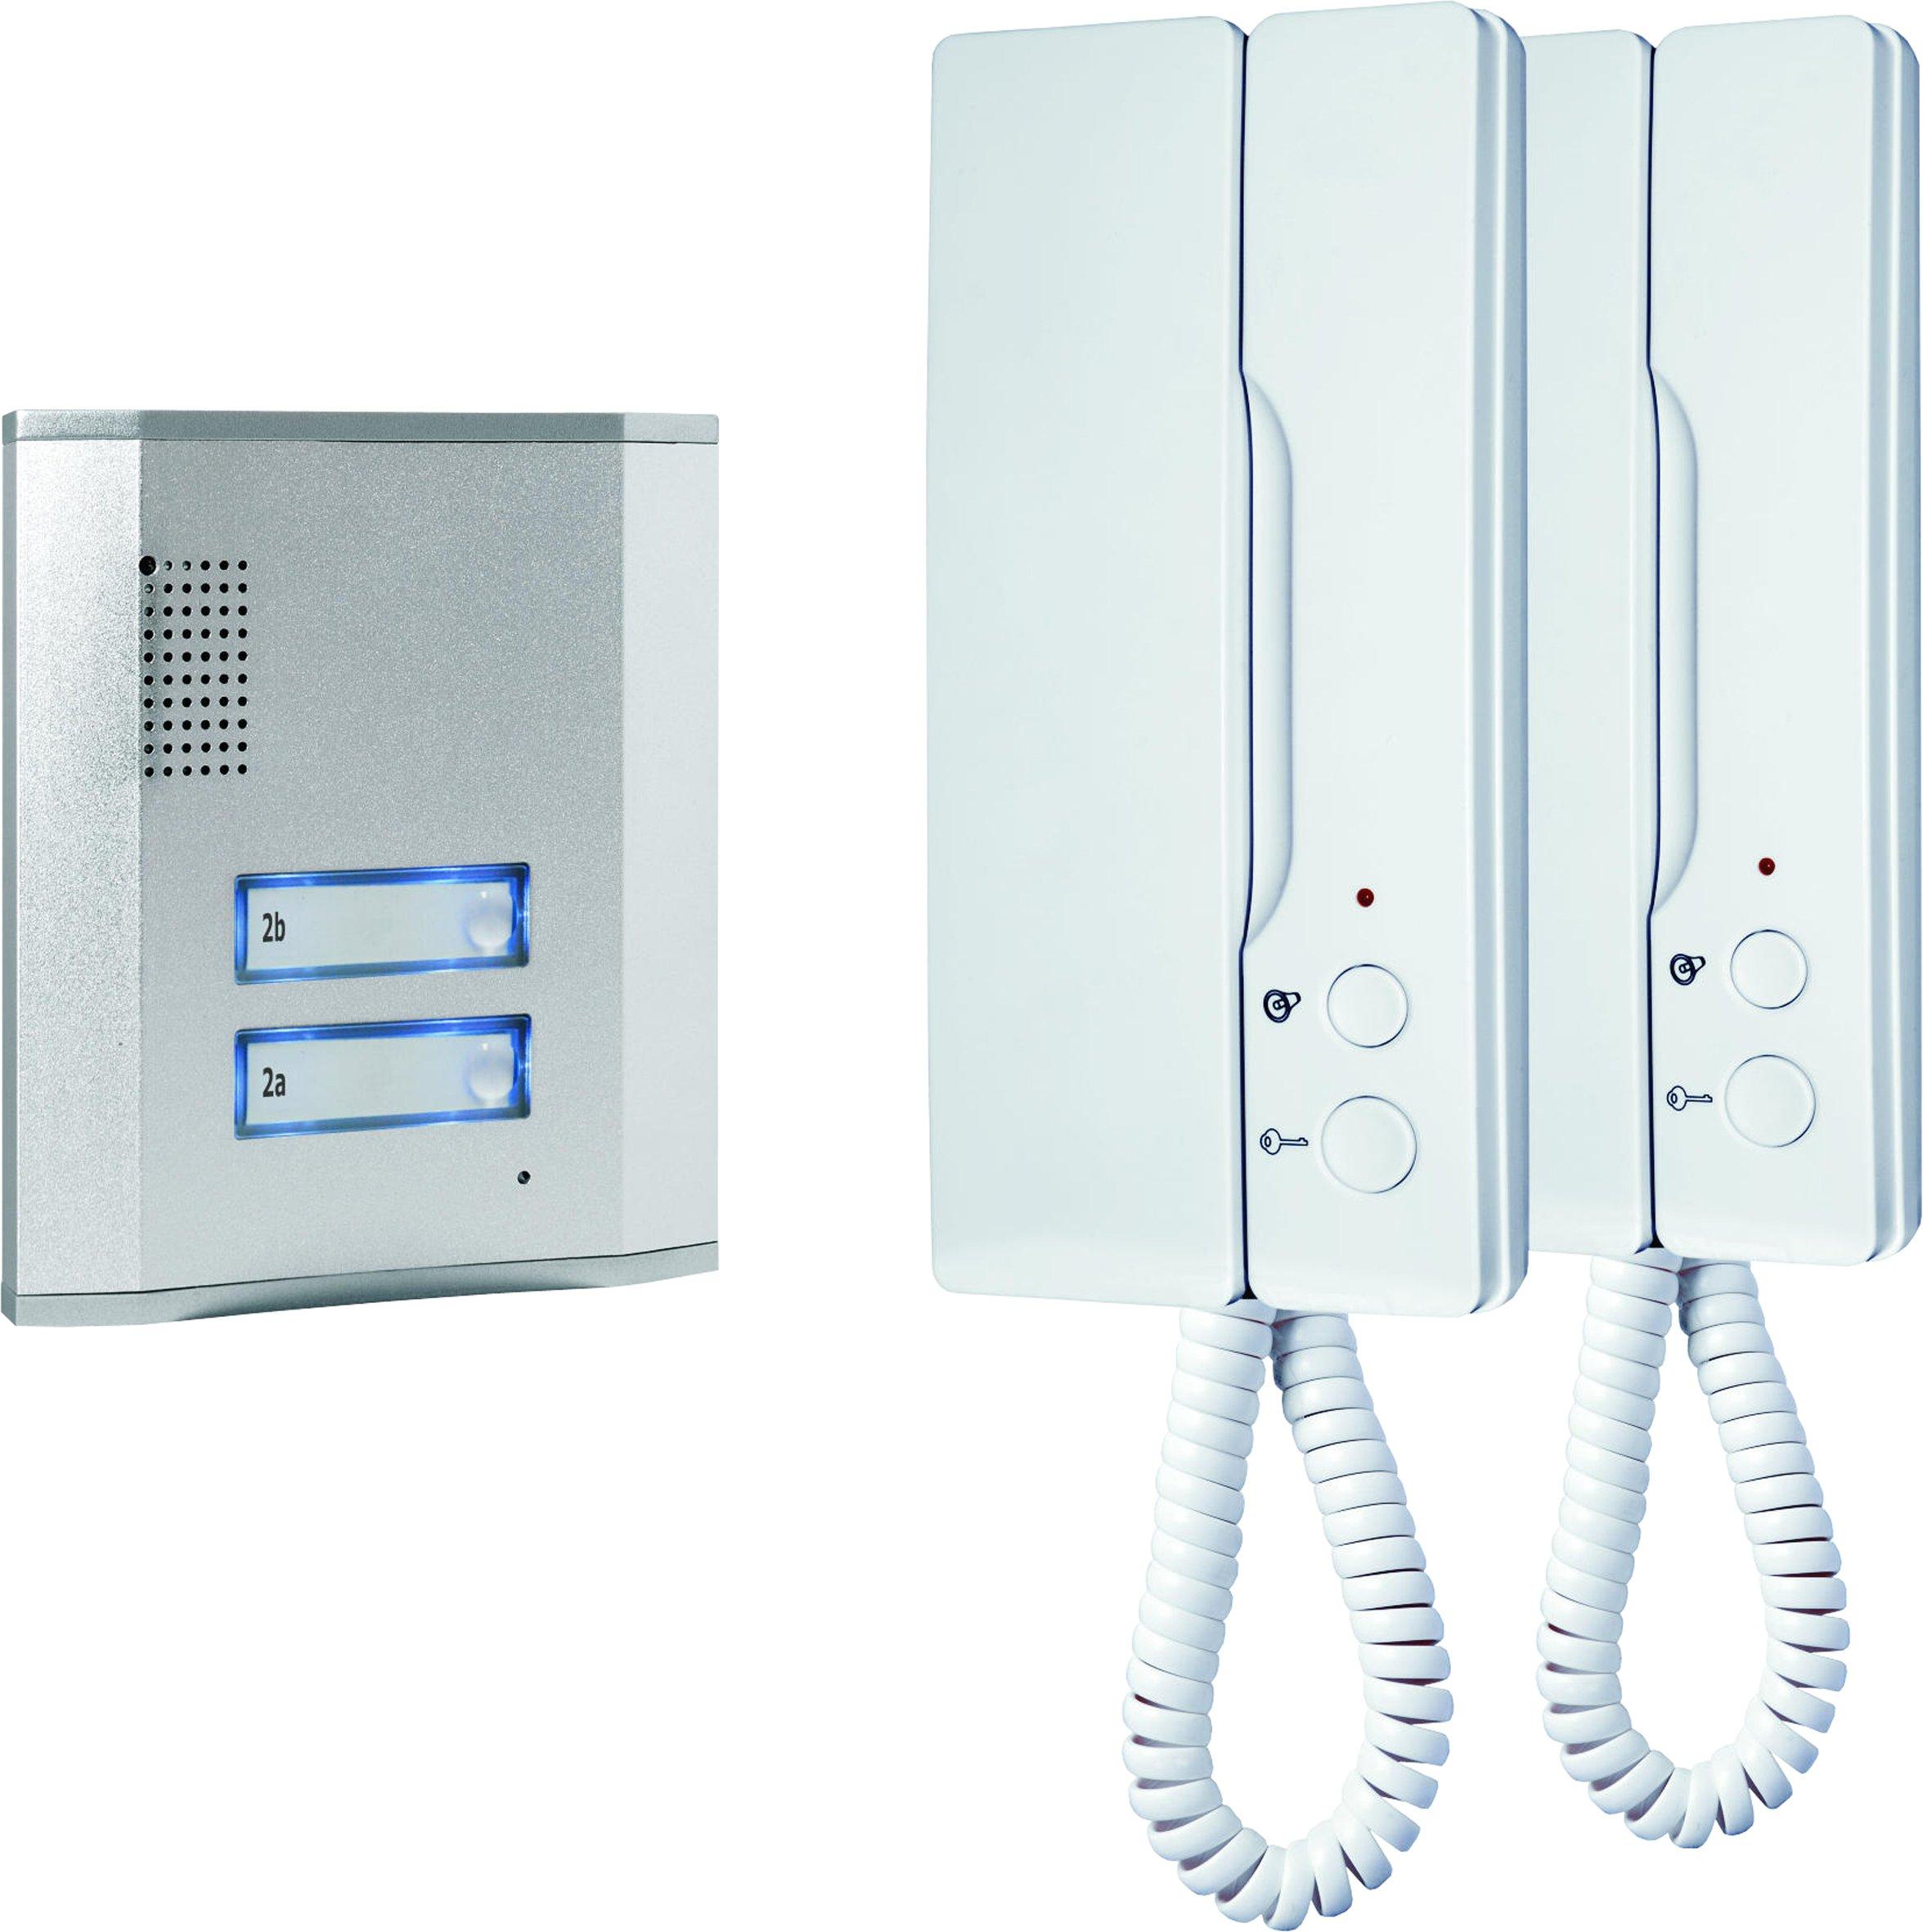 Smartwares IB62 SW 10.007.47 Interphone pour 2 appartements product image